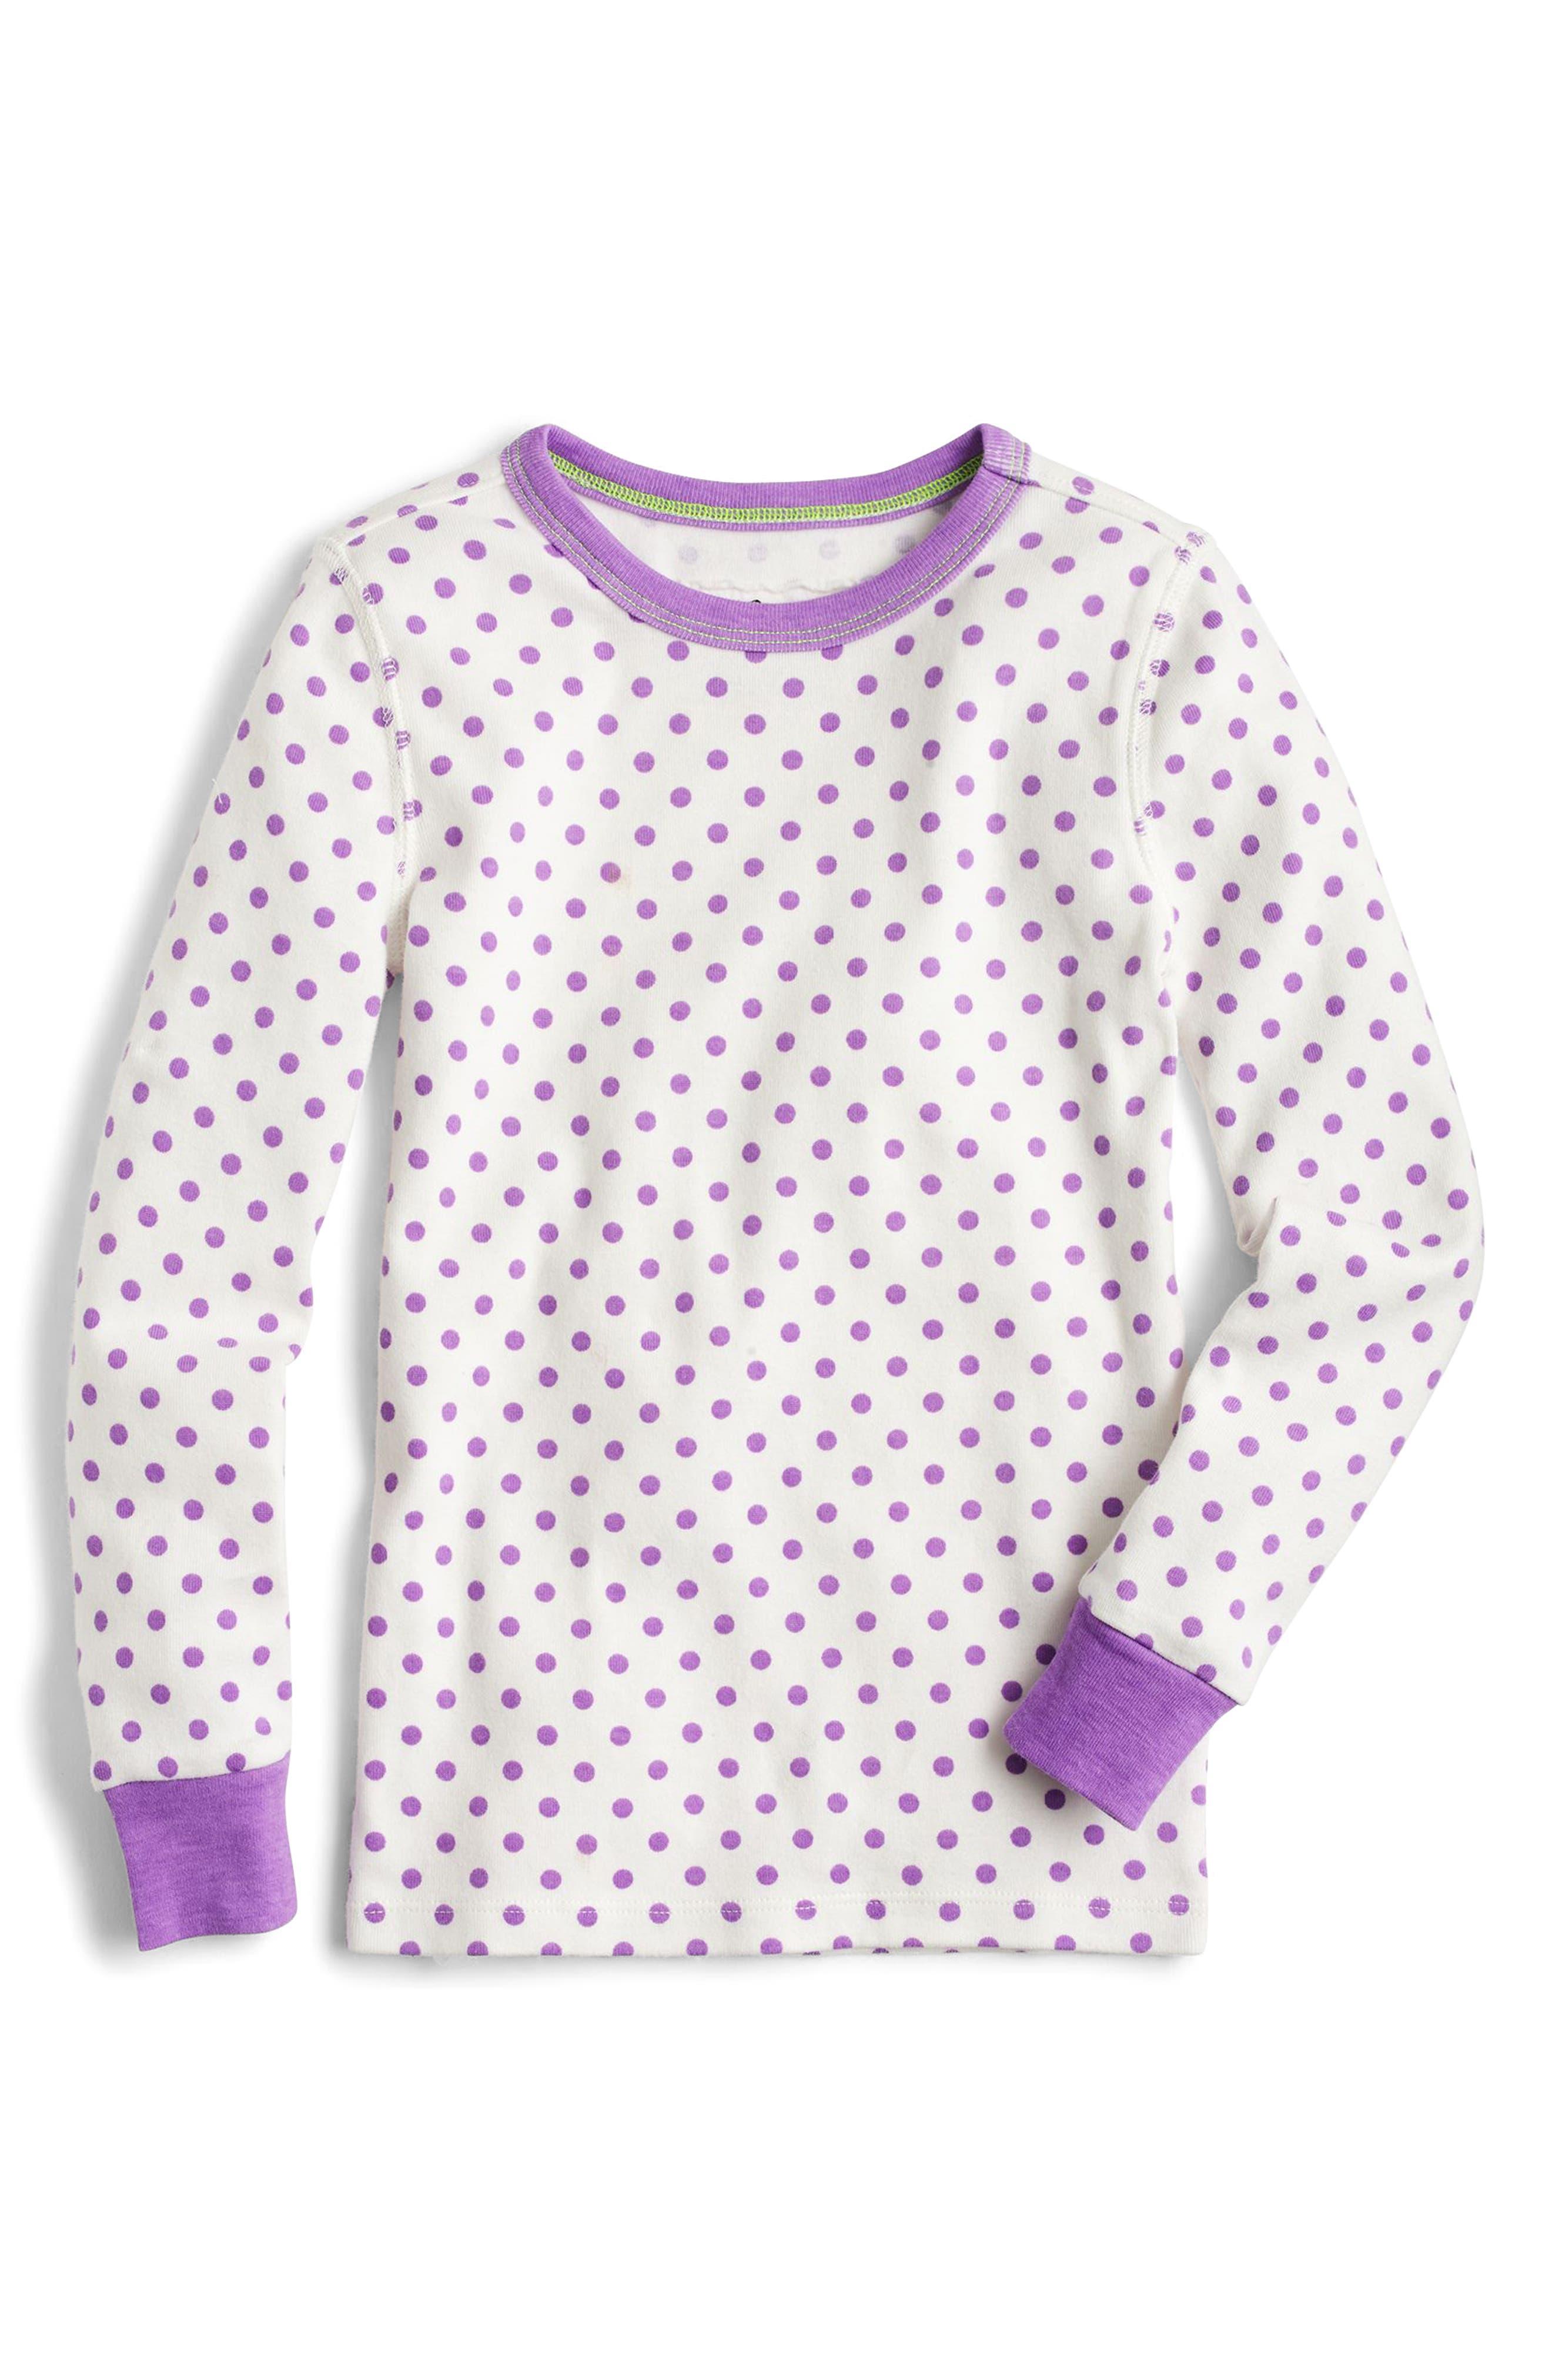 Alternate Image 2  - crewcuts by J.Crew Dot & Stripe Fitted Two-Piece Pajamas (Toddler Girls, Little Girls & Big Girls)